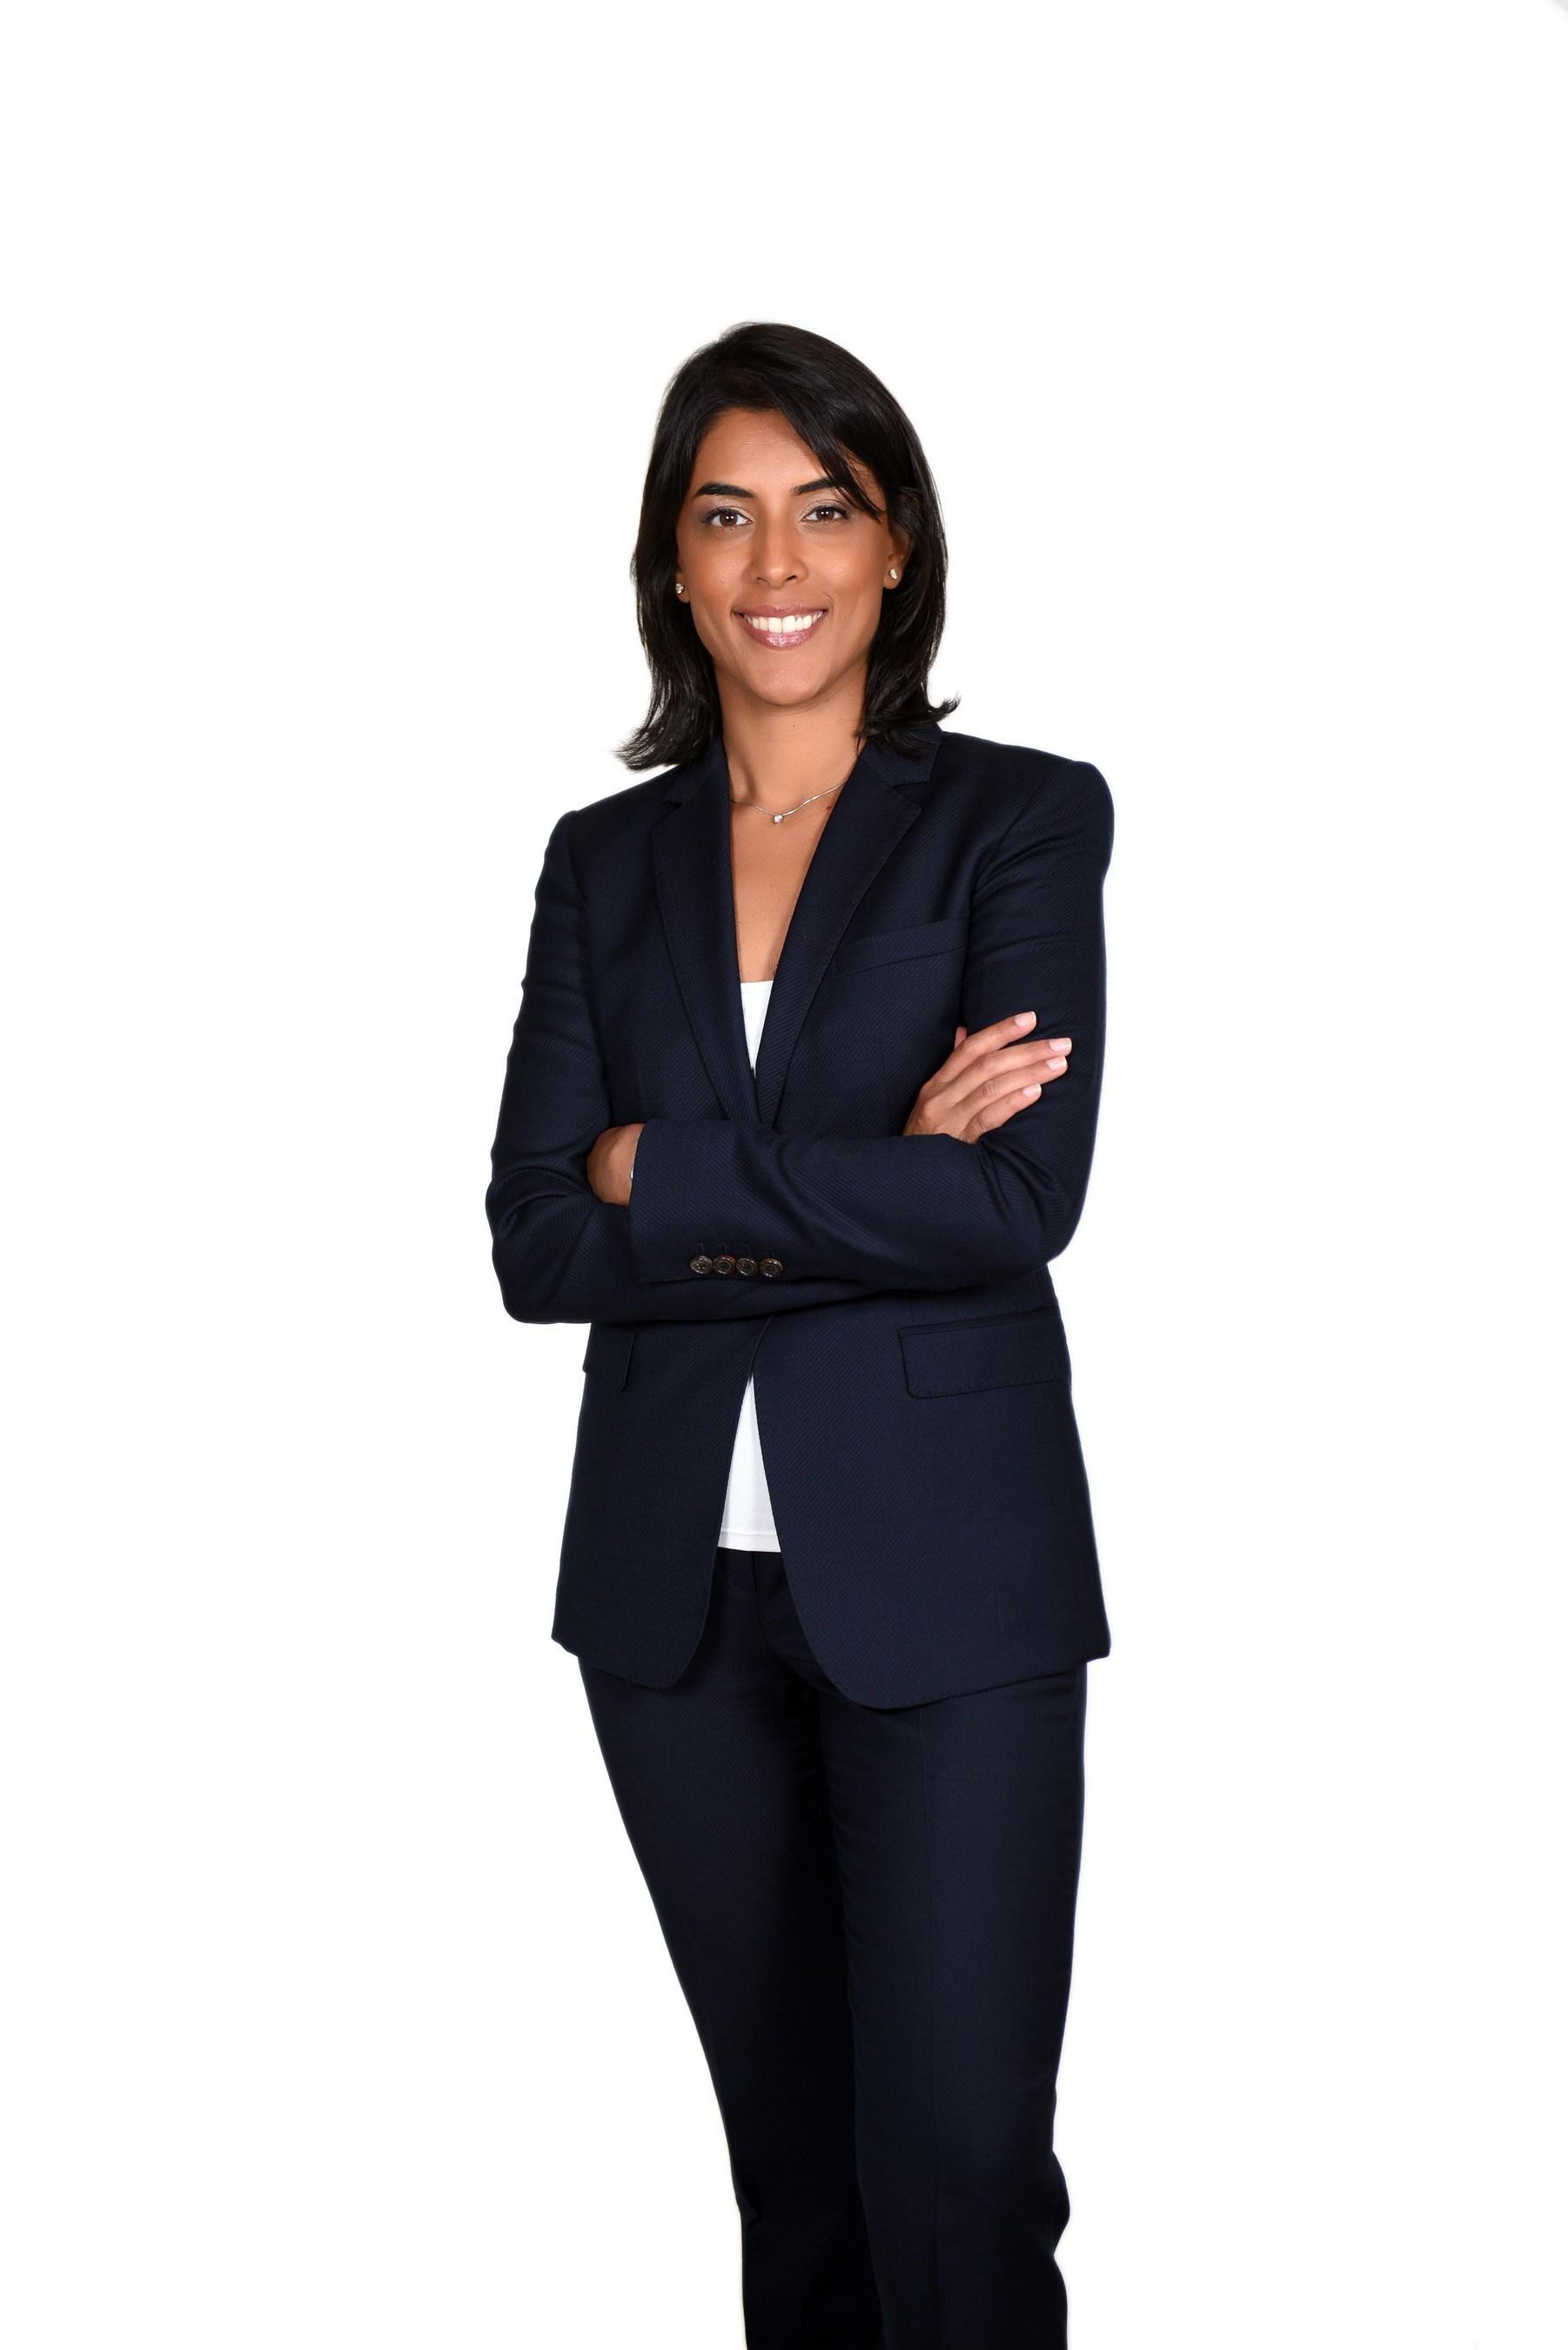 Souqalmal.com Ranked Amongst Top 100 SMEs in Dubai